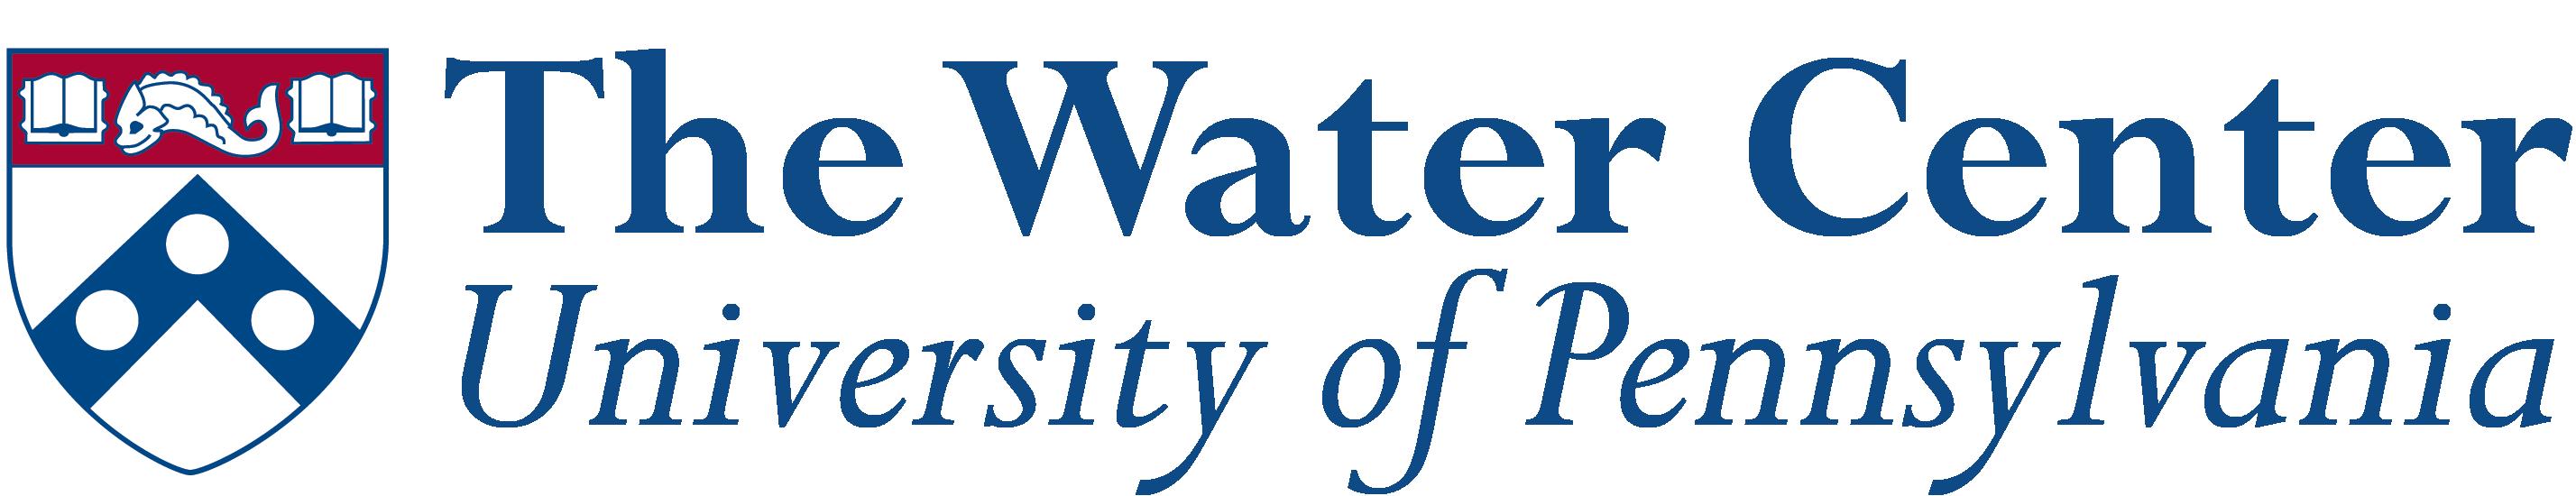 Water Center